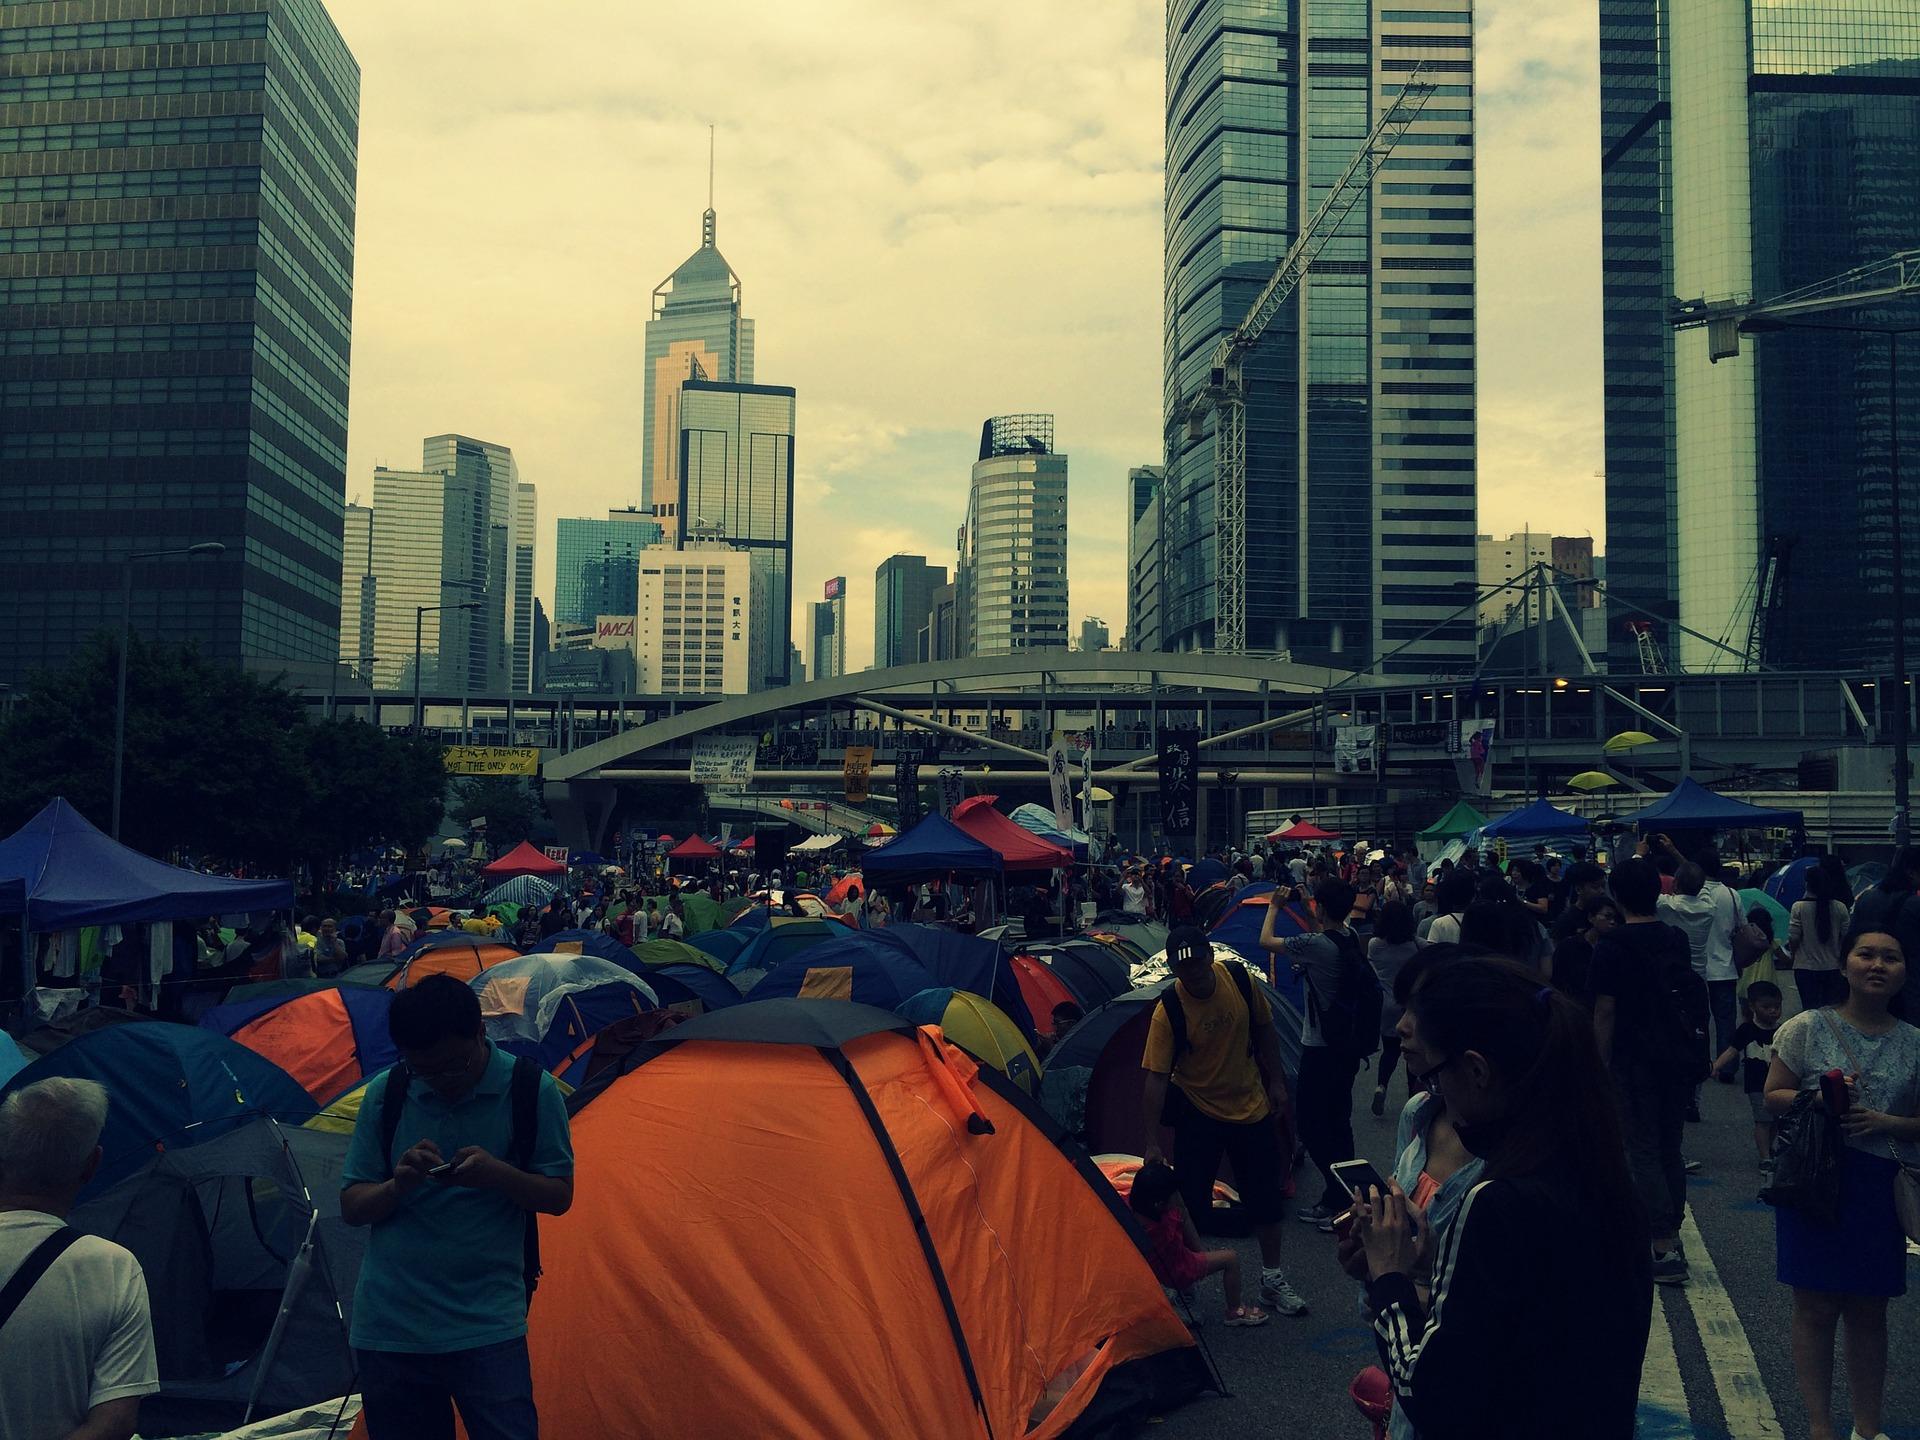 Tent protests in Hong Kong